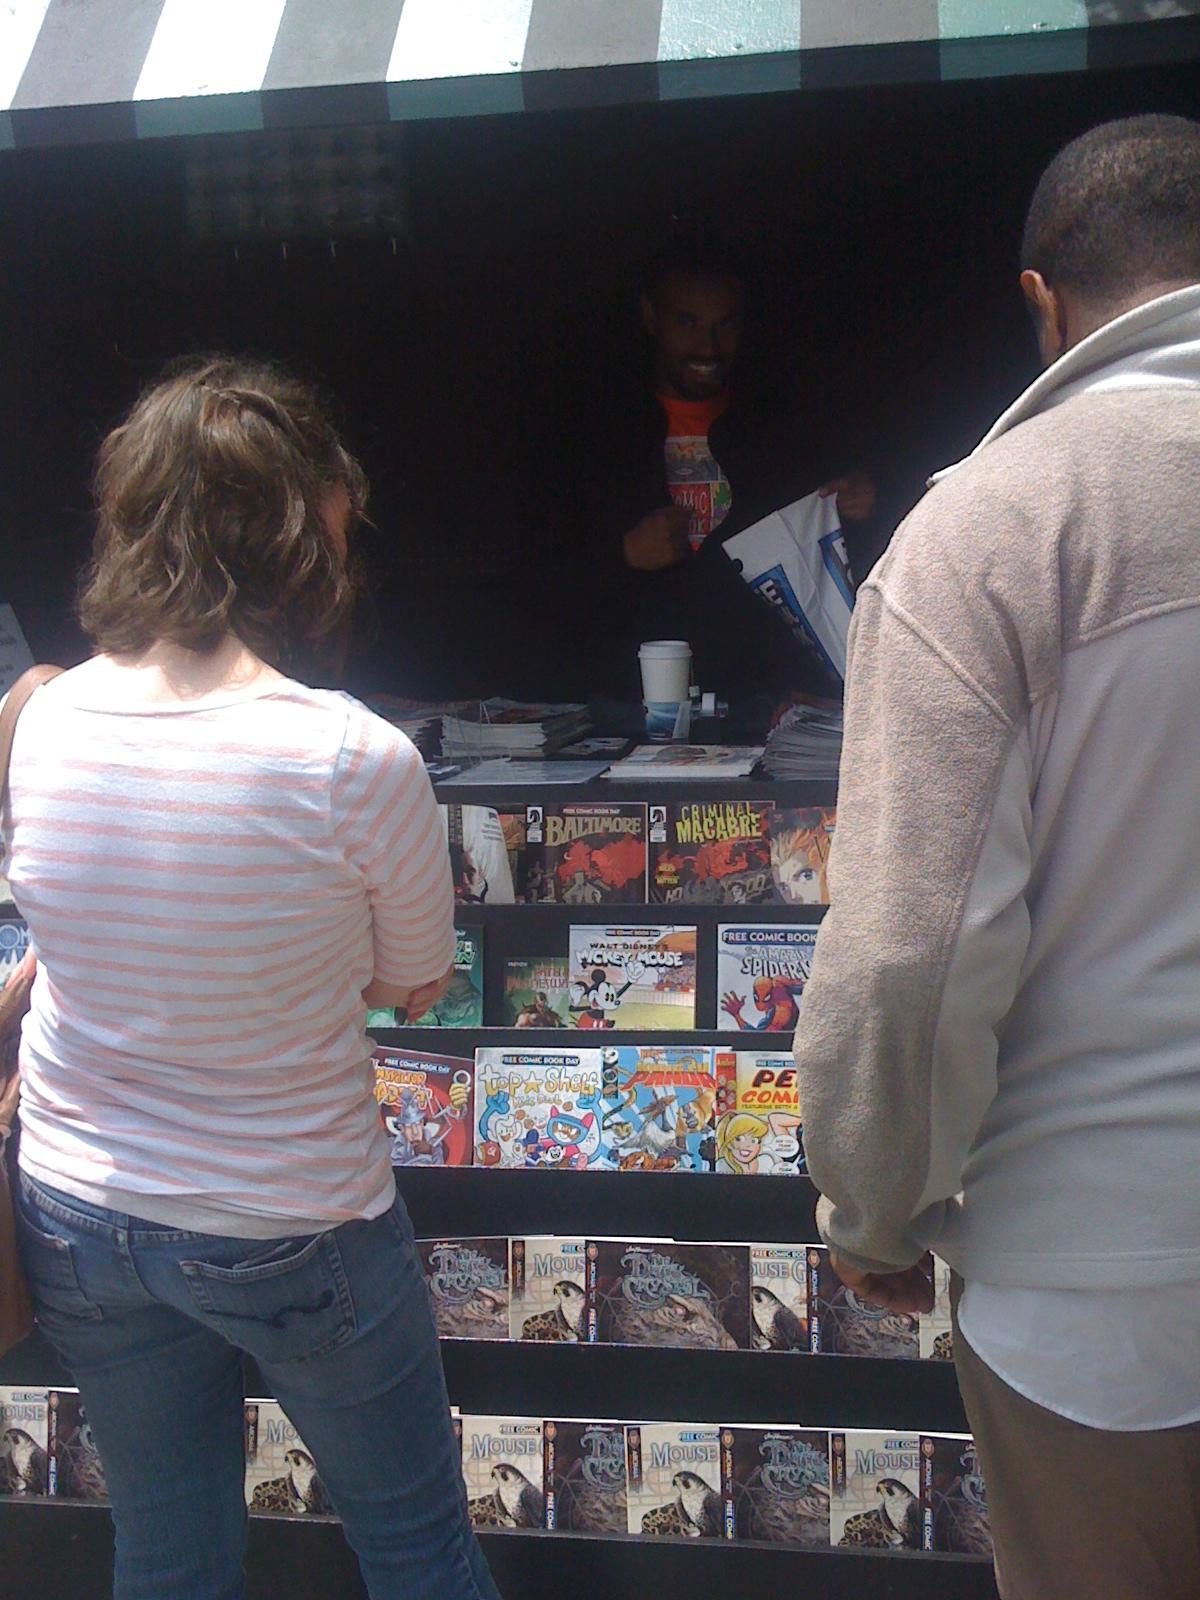 030 Tokyopop Garage Sale, Free Comic Book Day, Thor and Manga in Vienna